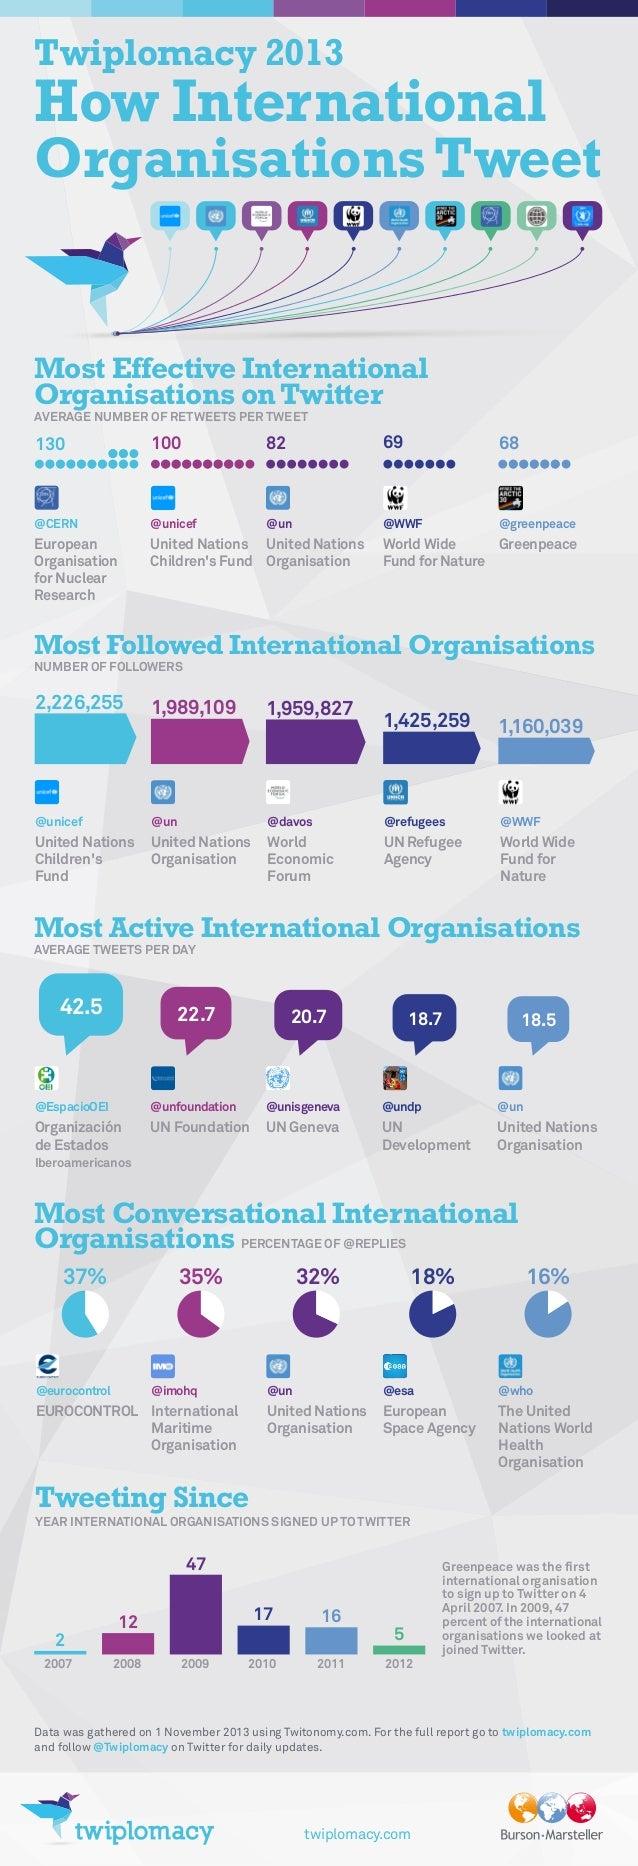 Twiplomacy 2013: How International Organisations Tweet